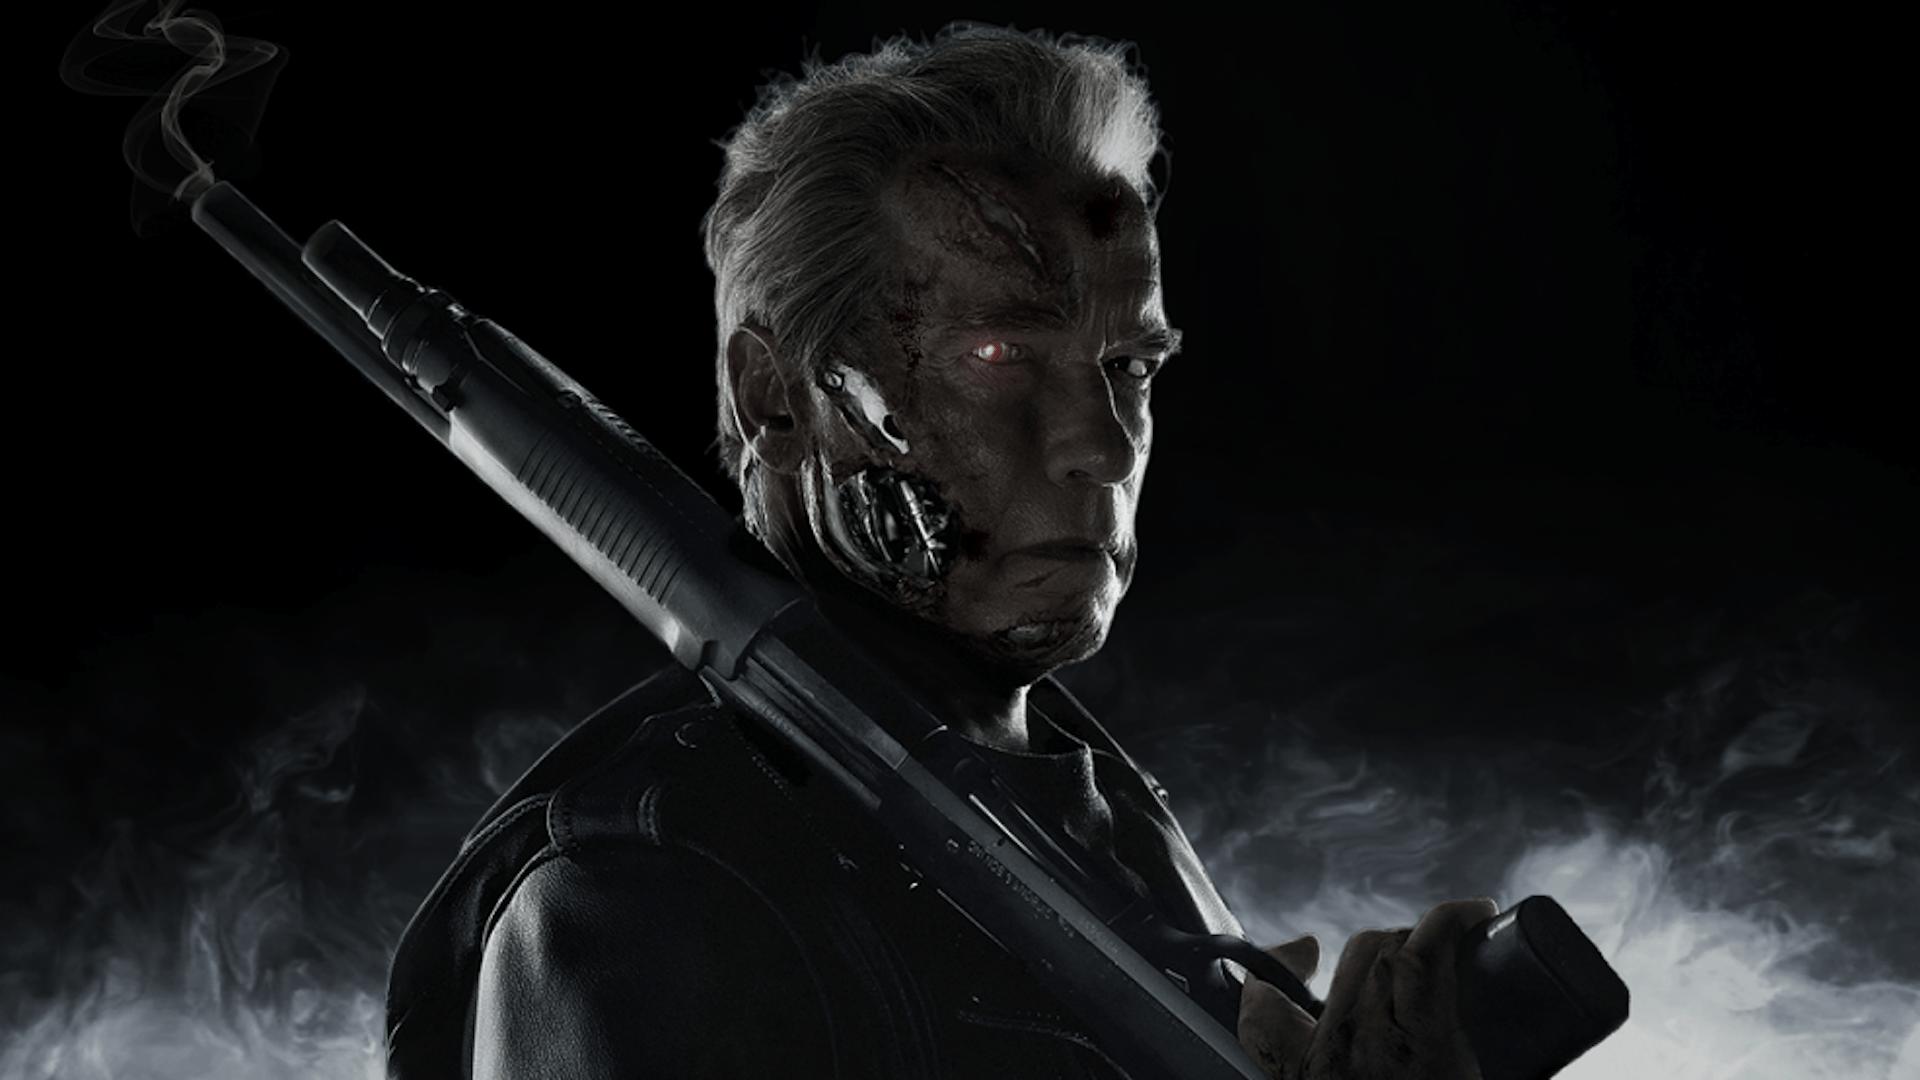 Terminator: Dark Fate Wallpapers - Top